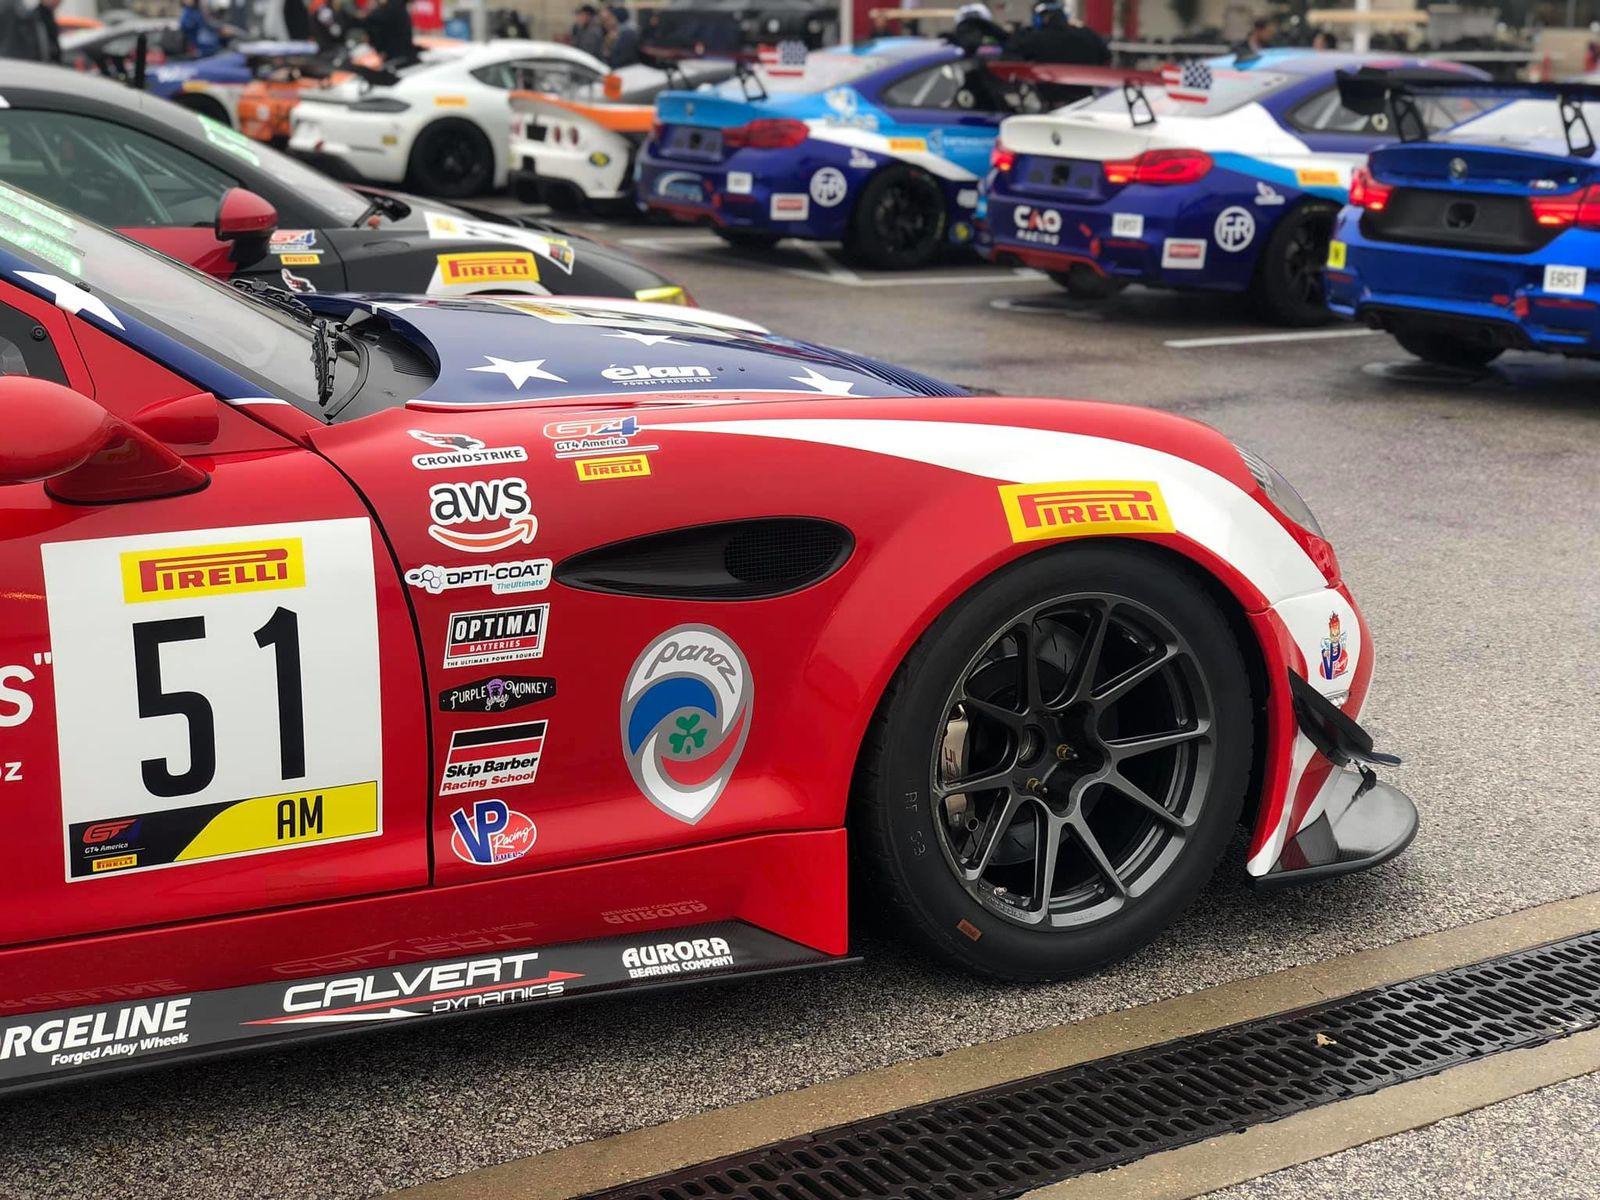 2019 Panoz  | Panoz Double Podium at Grand Prix Long Beach